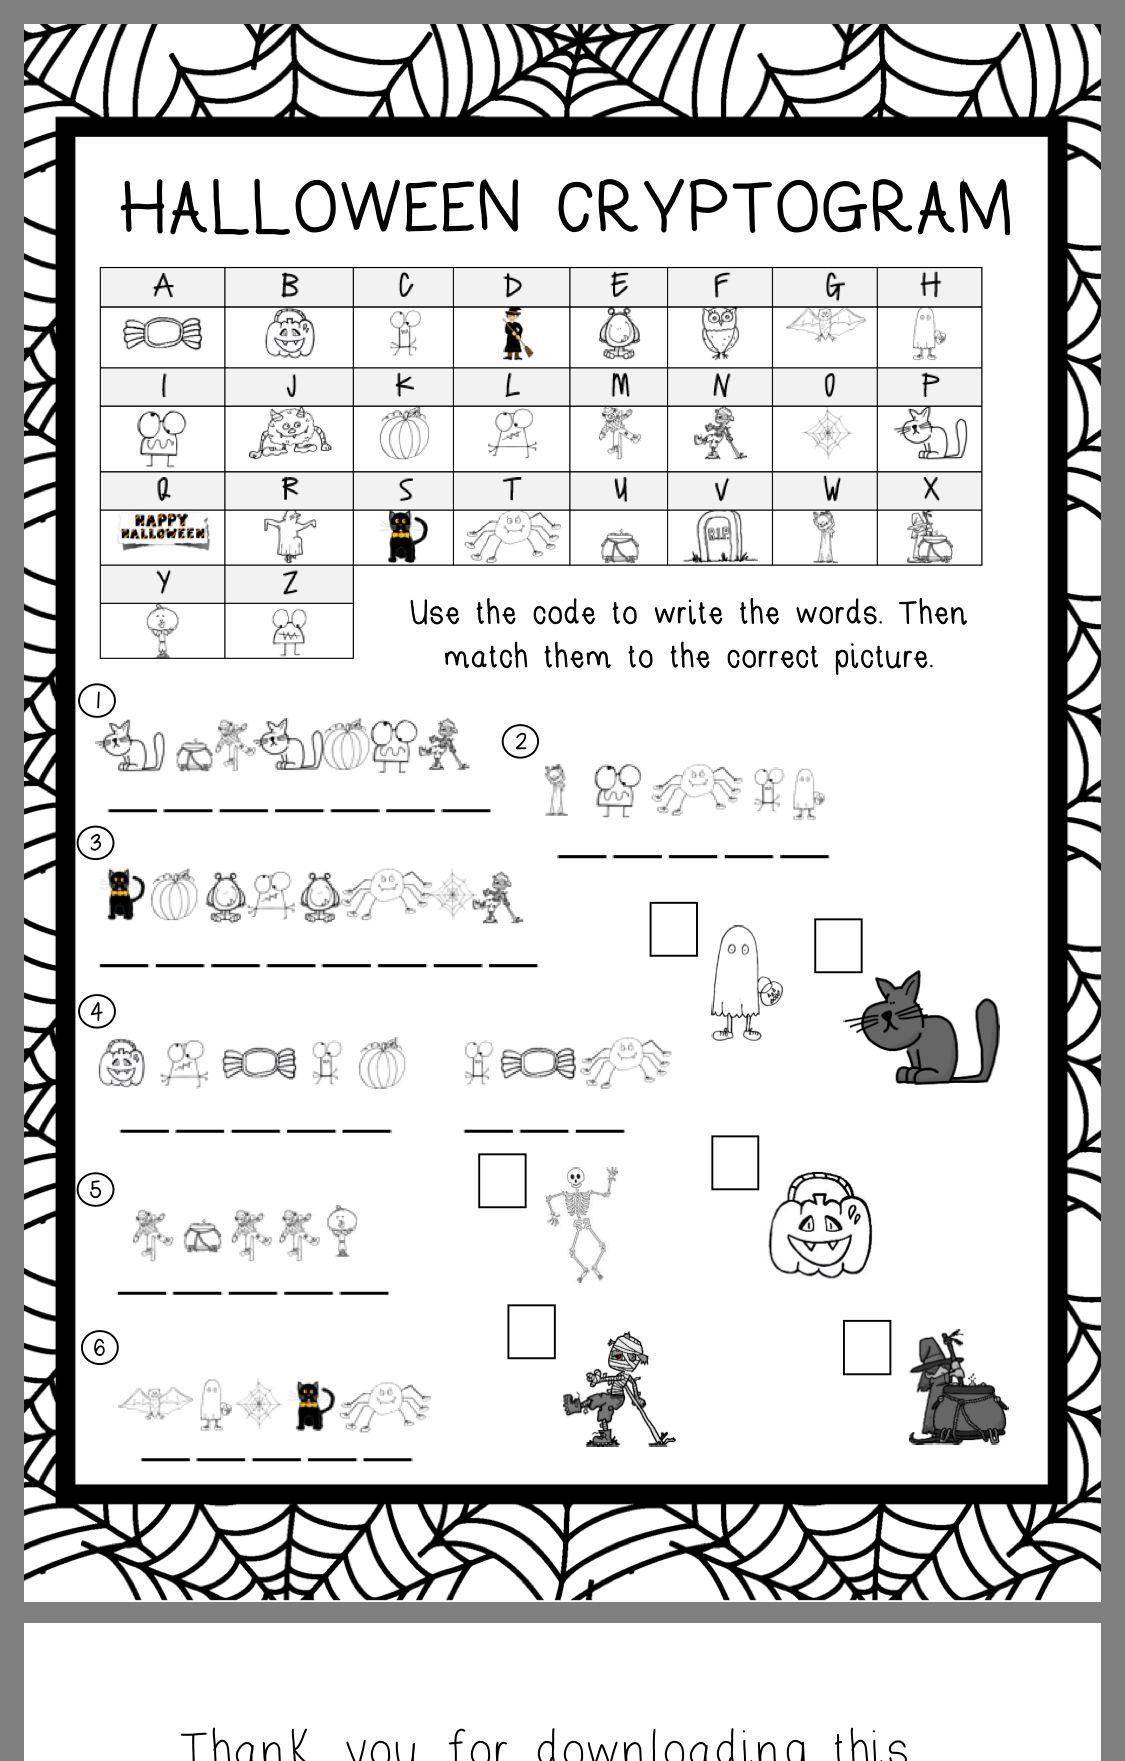 Halloween Worksheets For 2nd Grade In 2020 Halloween Worksheets Reading Foundational Skills 2nd Grade Worksheets